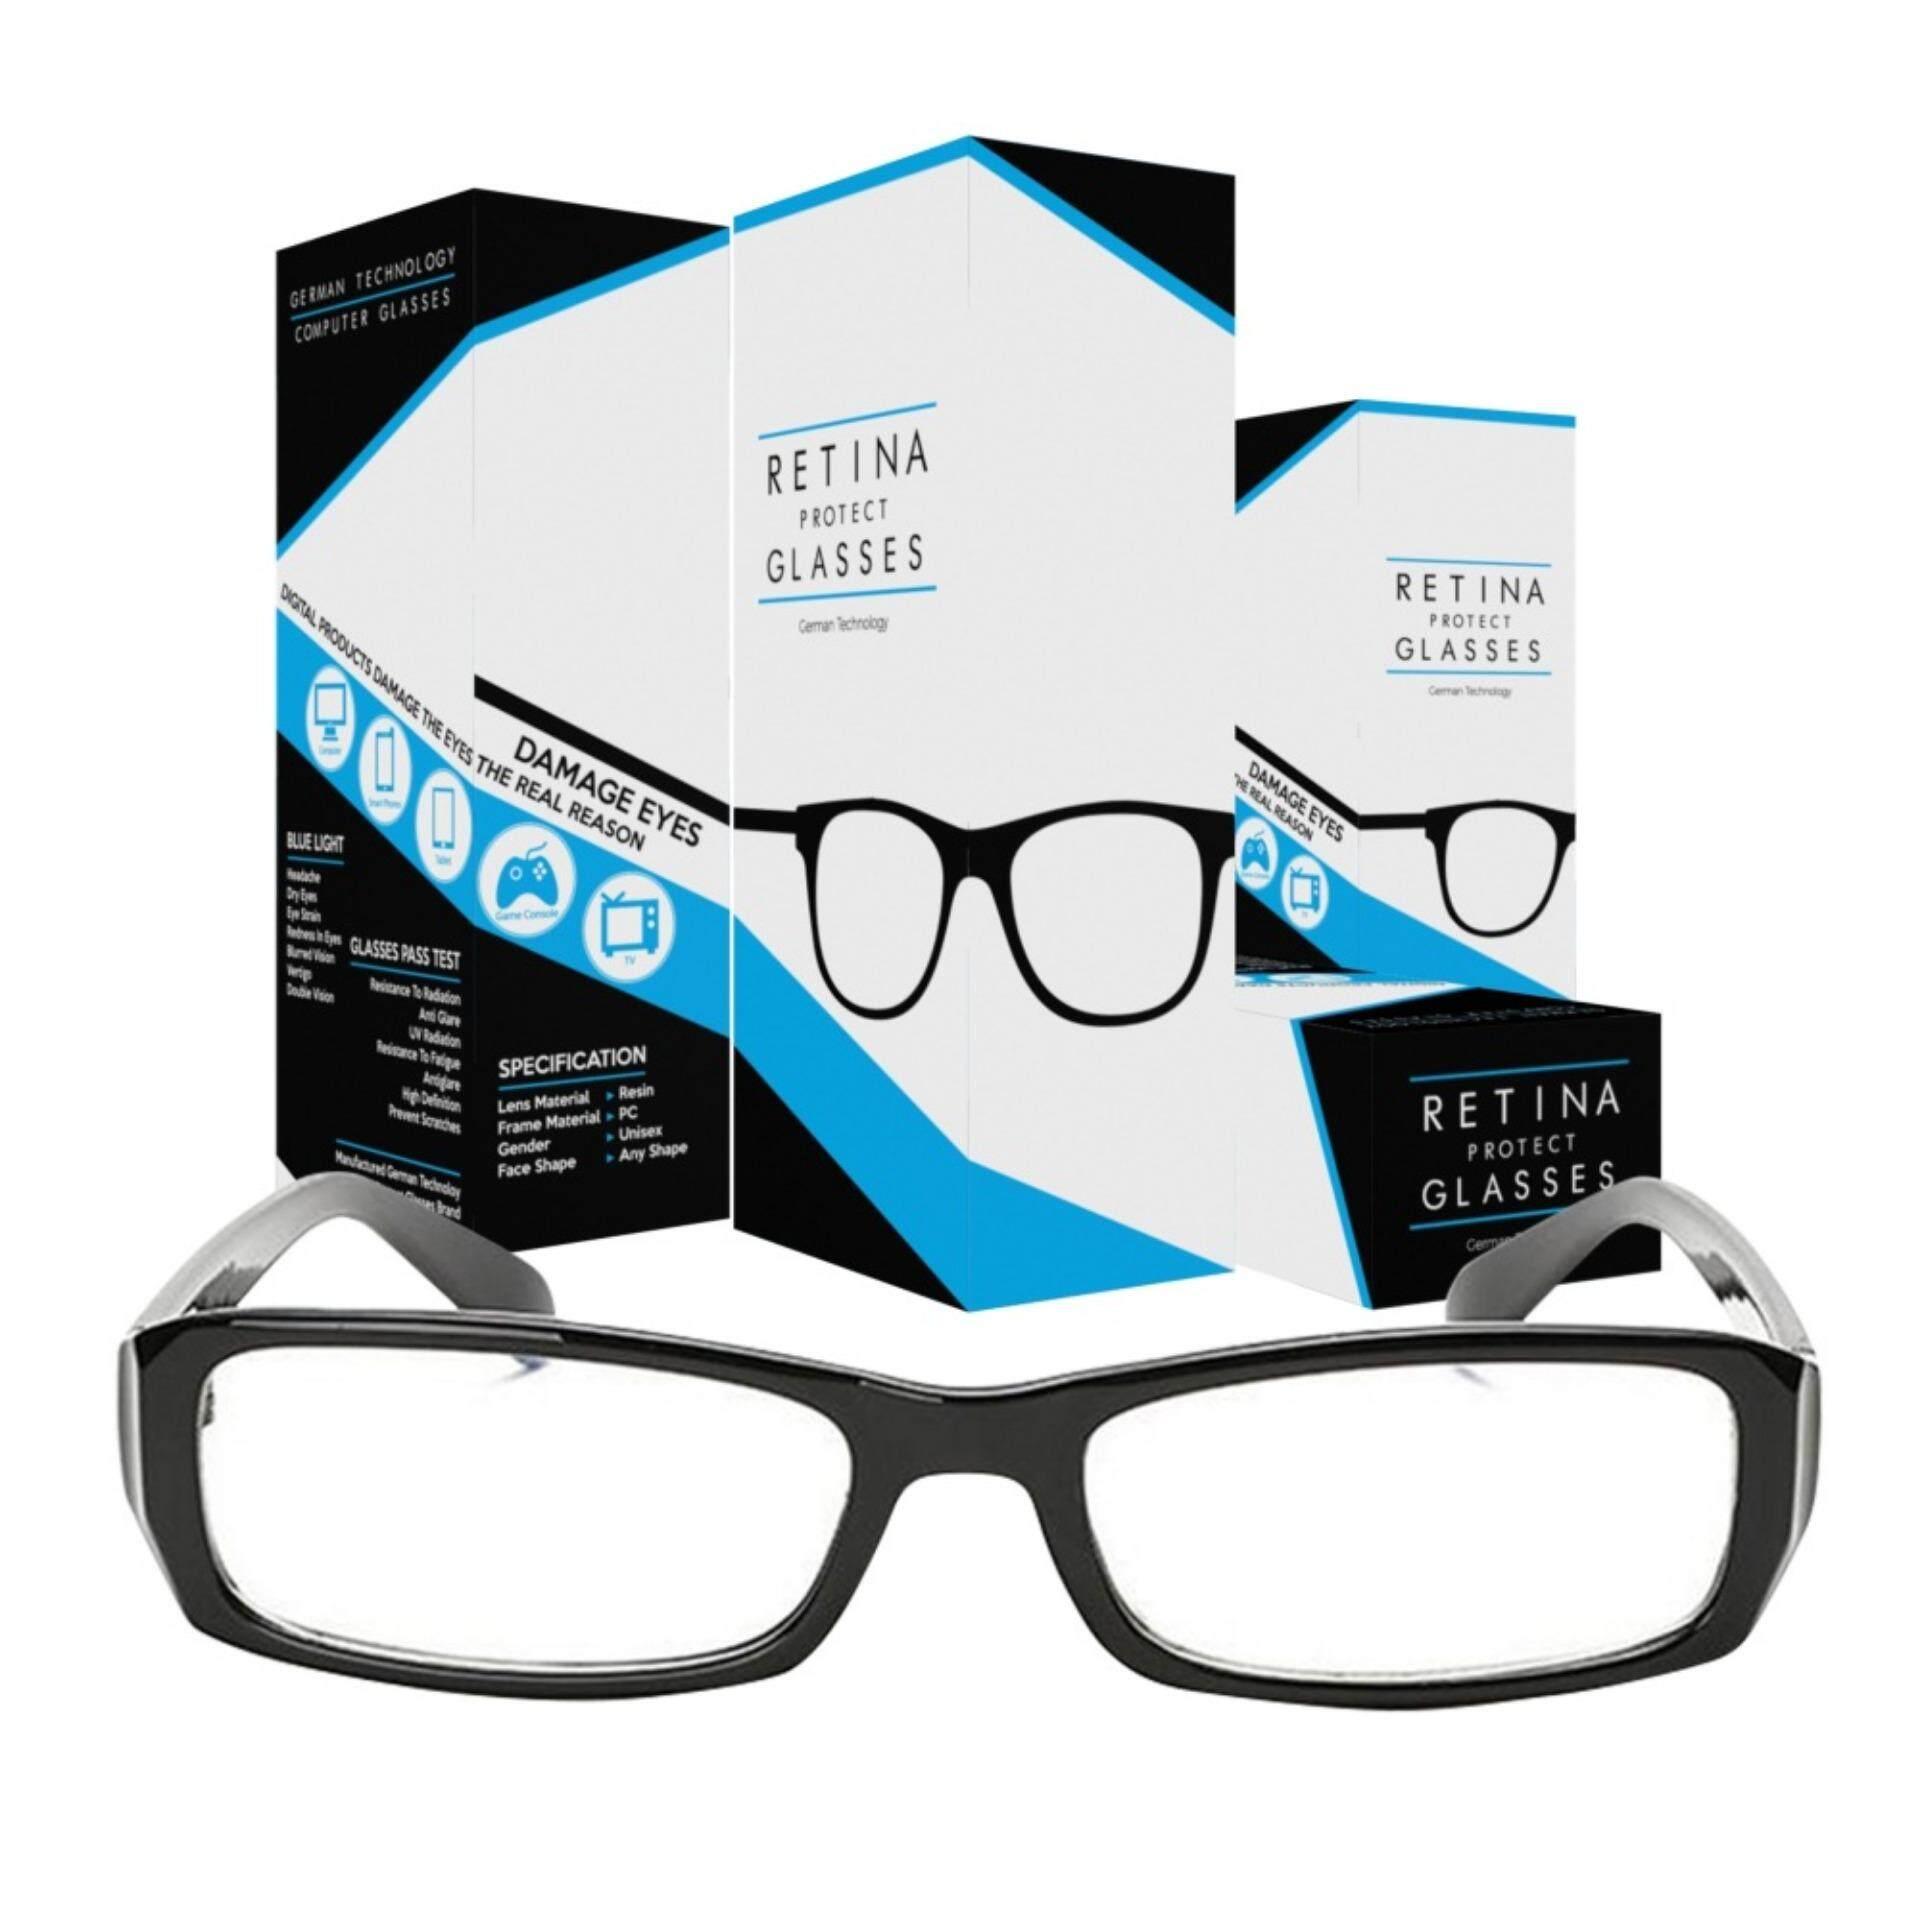 Retina Protect Glasses Computer Glasses แว่นคอมพิวเตอร์ แว่นกรองแสงคอมพิวเตอร์ แว่นถนอมสายตา แว่นกรองแสงสีฟ้า By Shopthai.